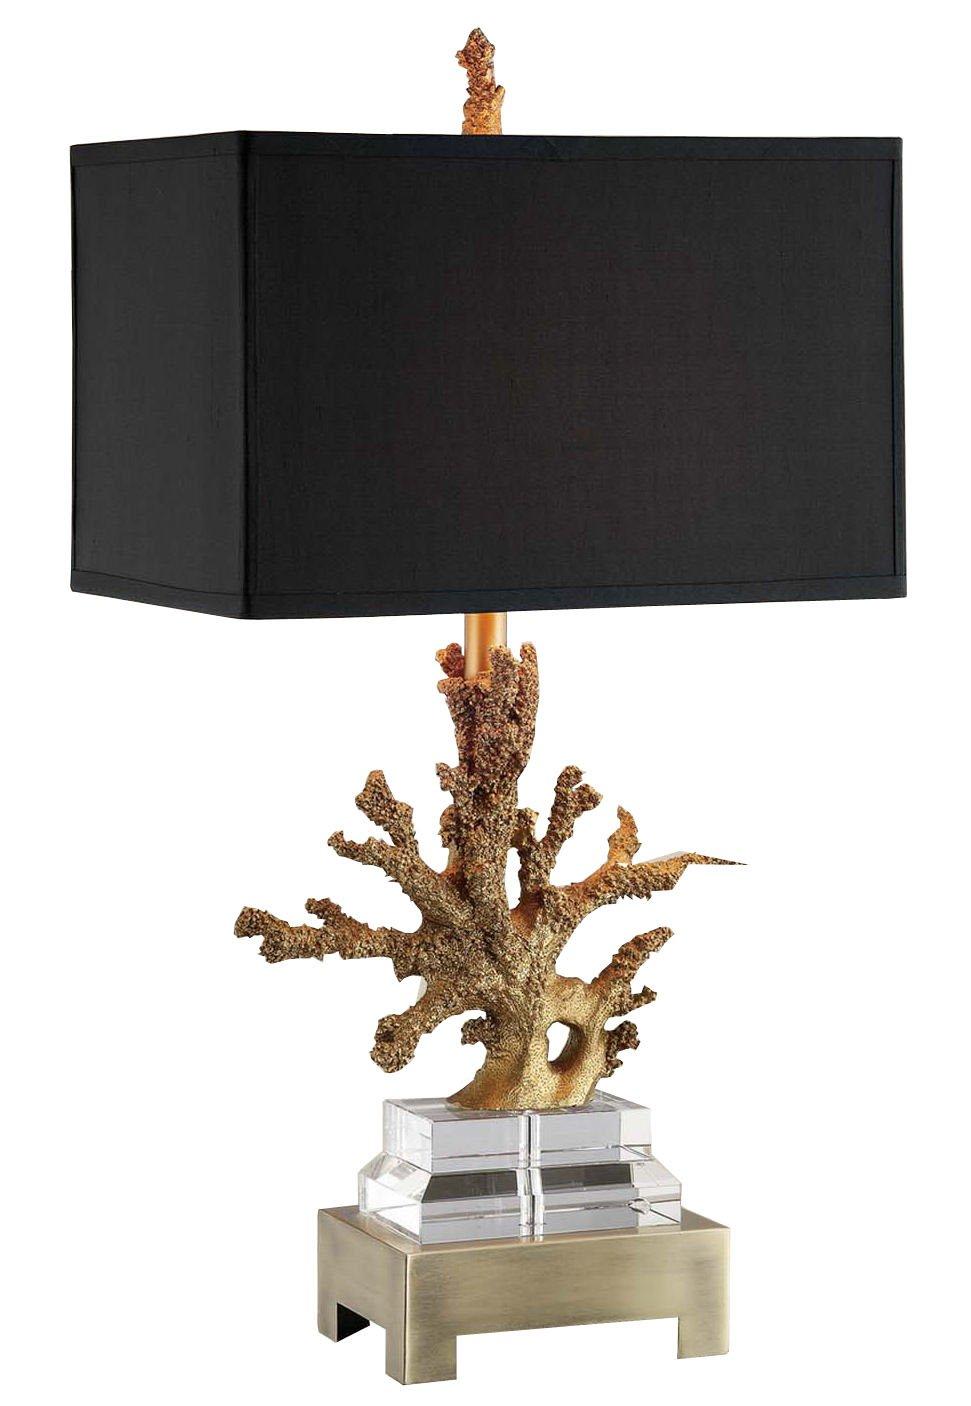 Amita Trading Gold Coral Table Lamp with Shade by Amita Trading B00U8TKXBY